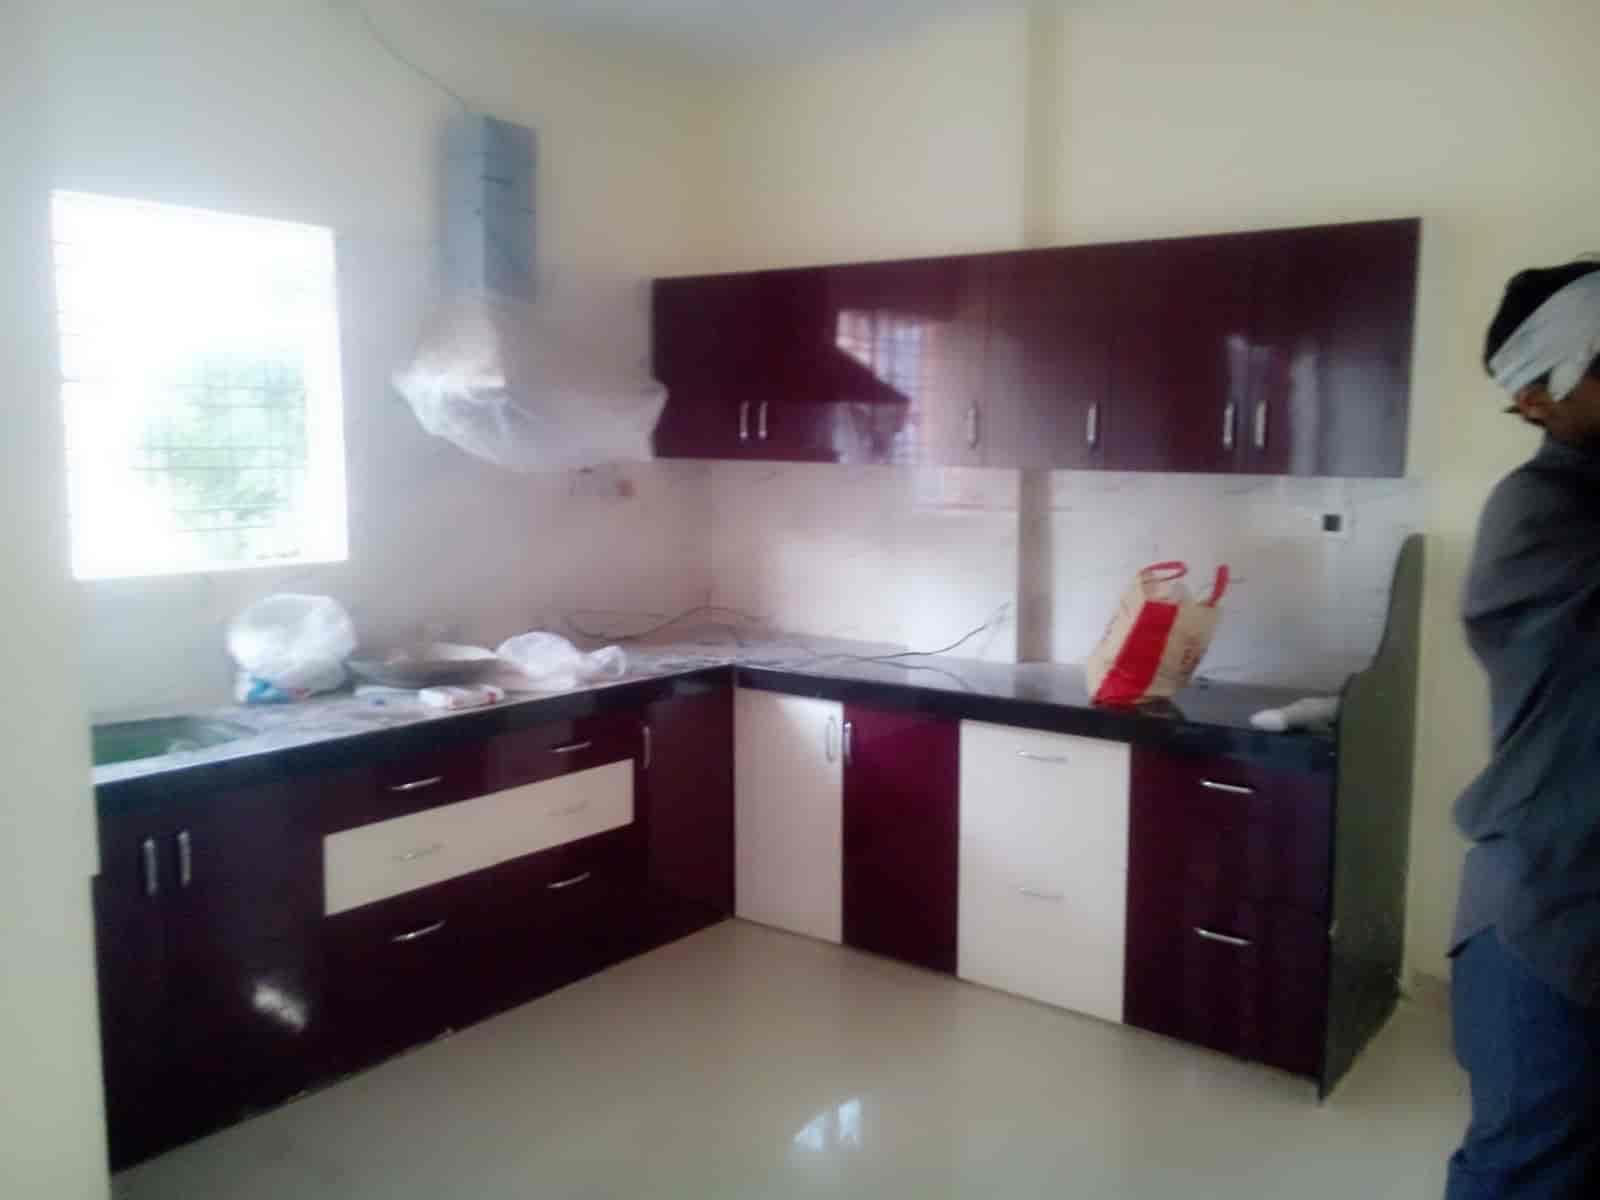 indian modular kitchen photos subhash nagar nagpur pictures rh justdial com Godrej Modular Kitchen Godrej Modular Kitchen